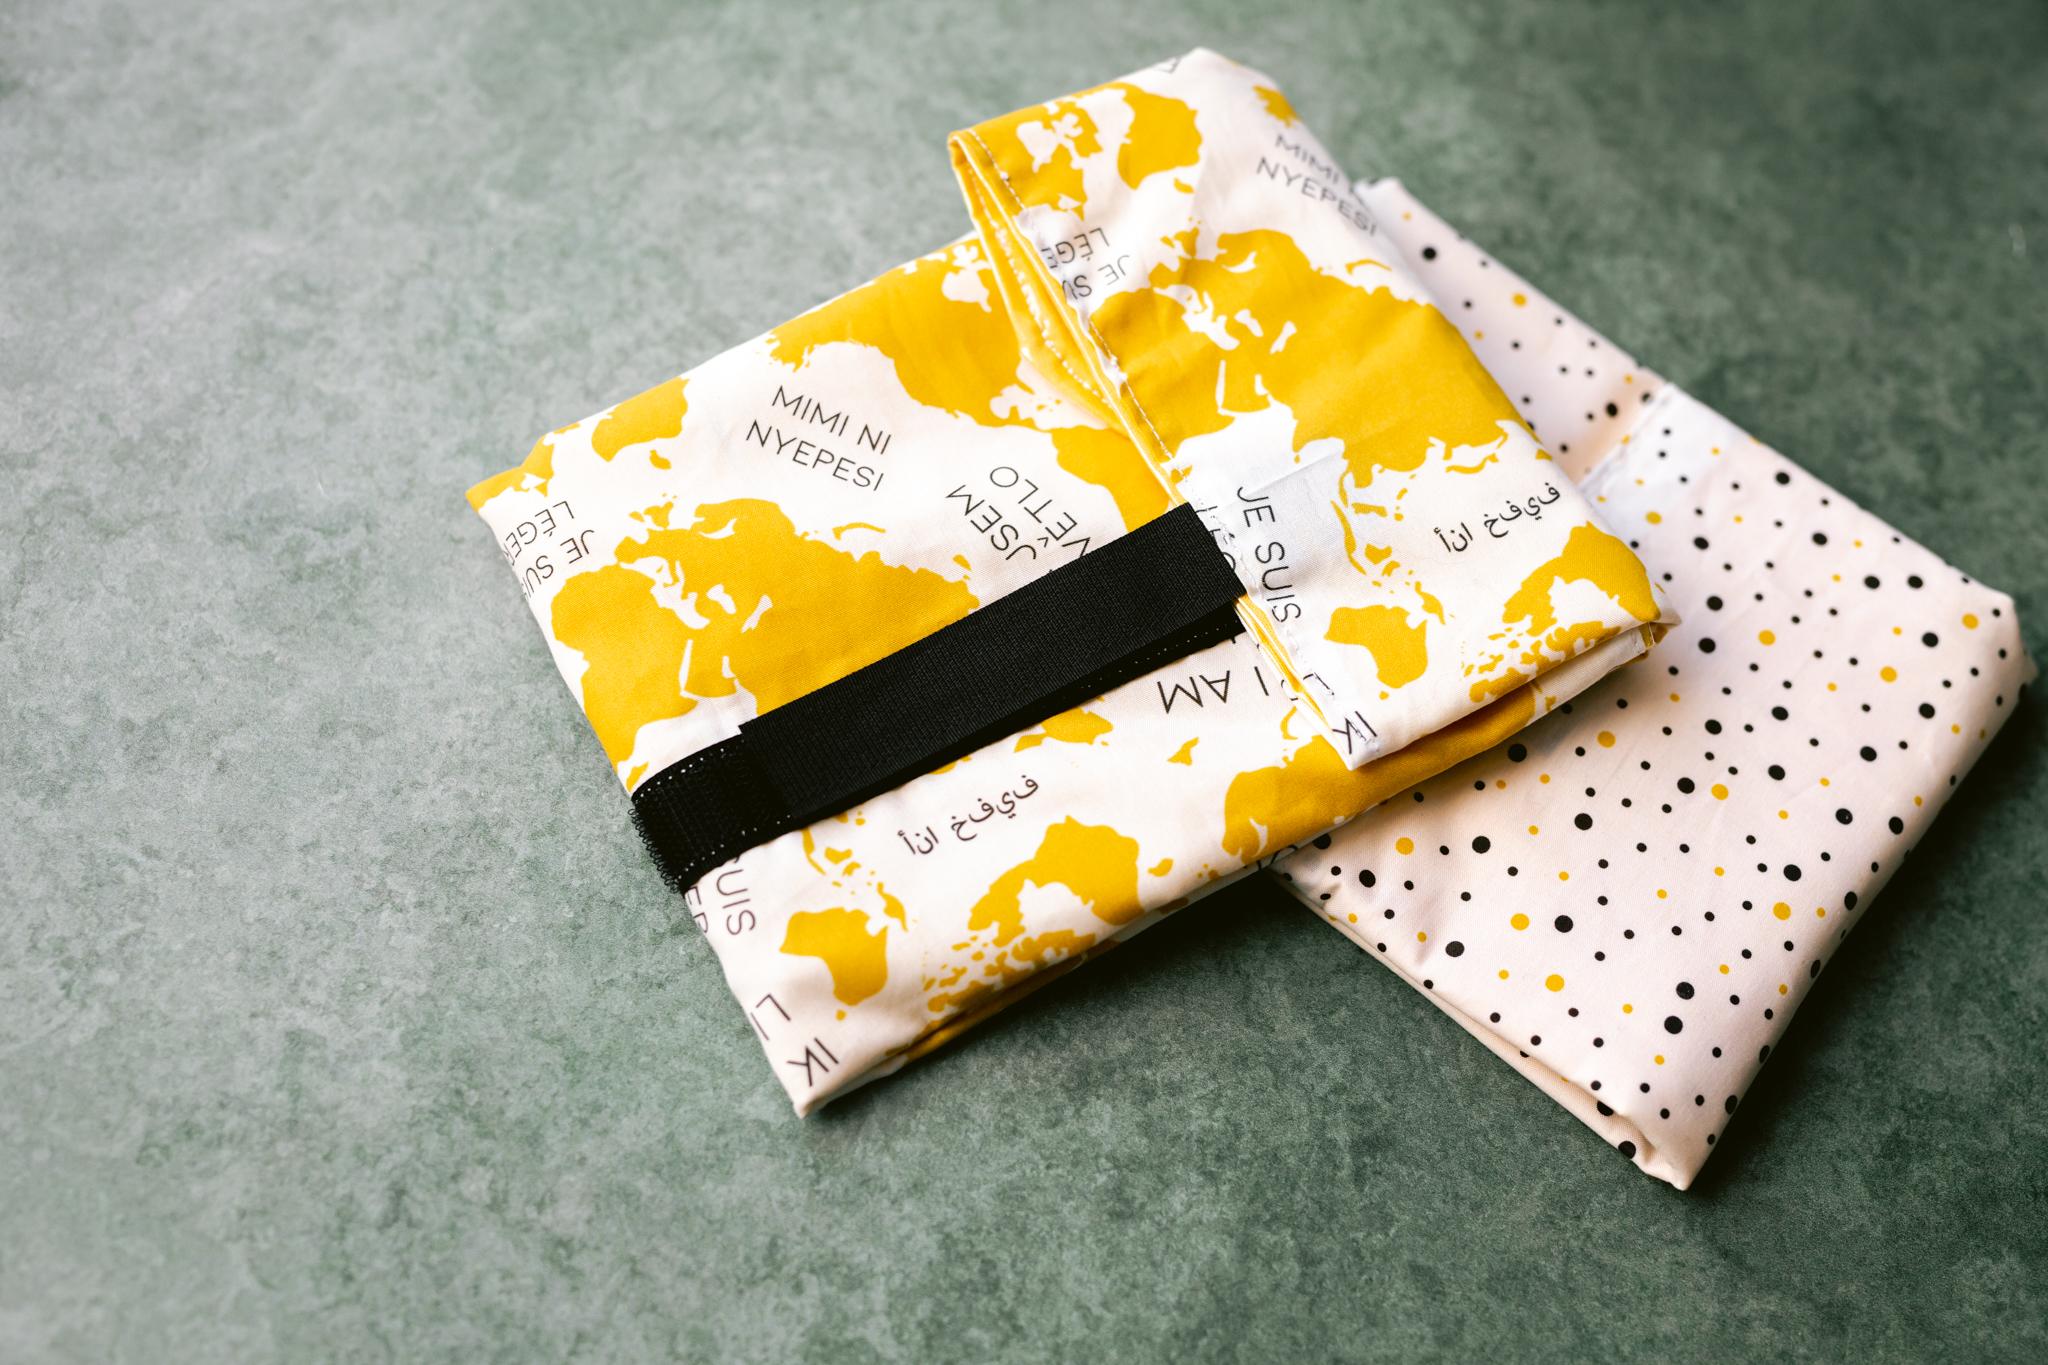 Lunchwraps